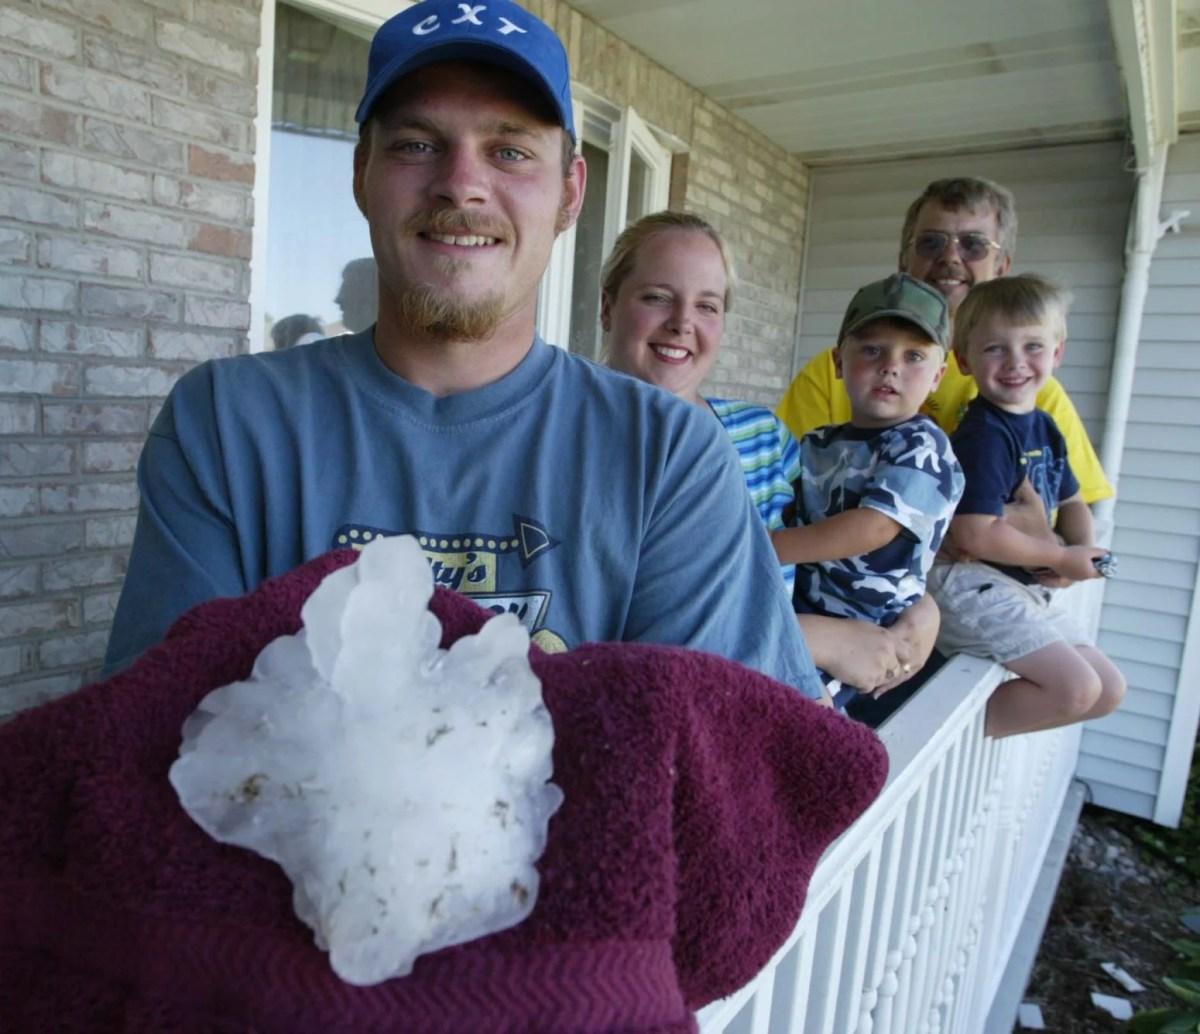 June 22, 2003: Super-sized hailstone